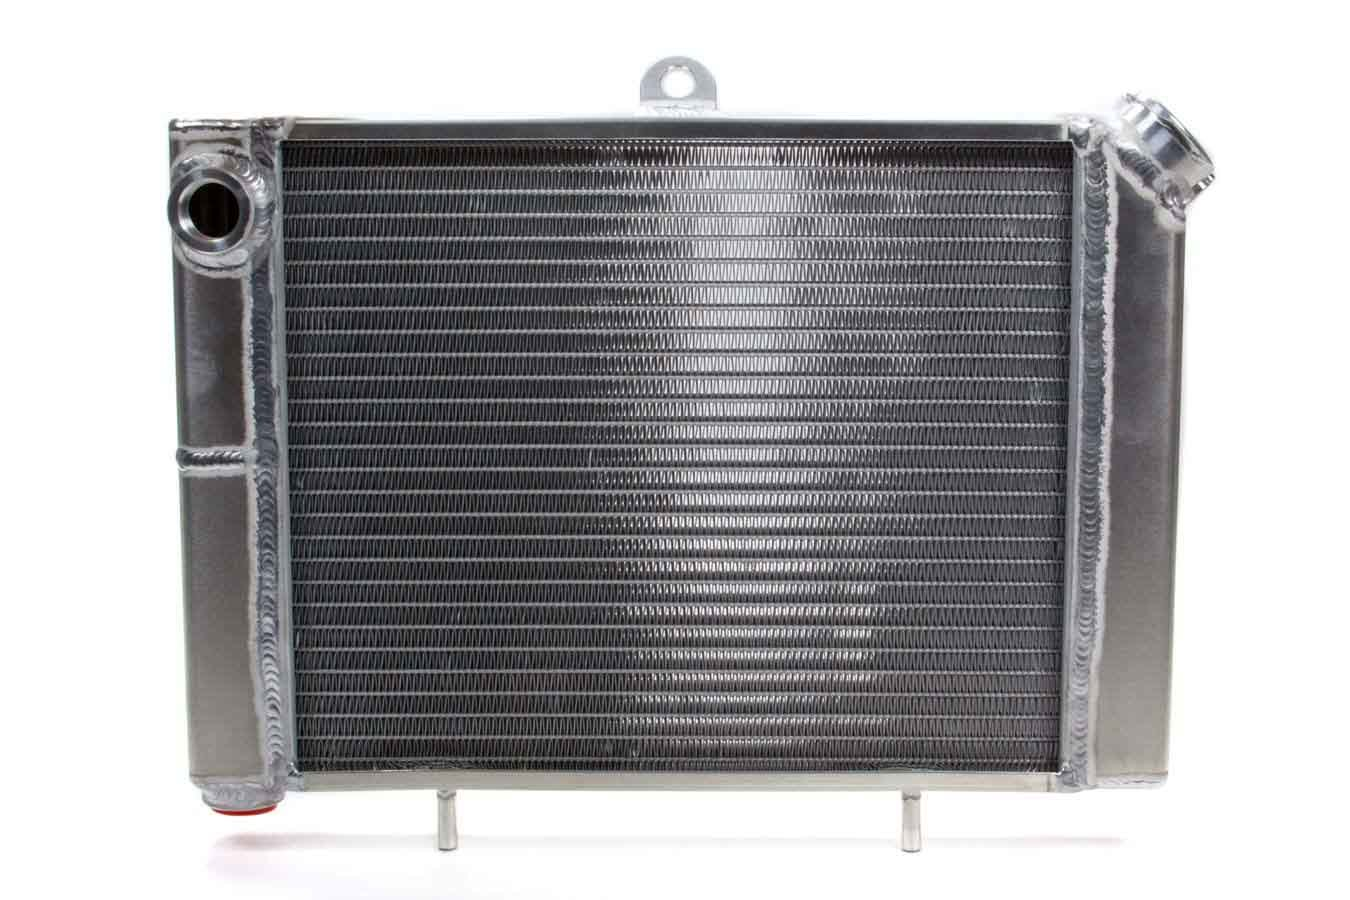 Saldana MSR Radiator, 17-3/4 in W x 12 in H x 1-13/16 in D, Driver Side Inlet, Passenger Side Outlet, Aluminum, Natural, Mini Sprint, Kit